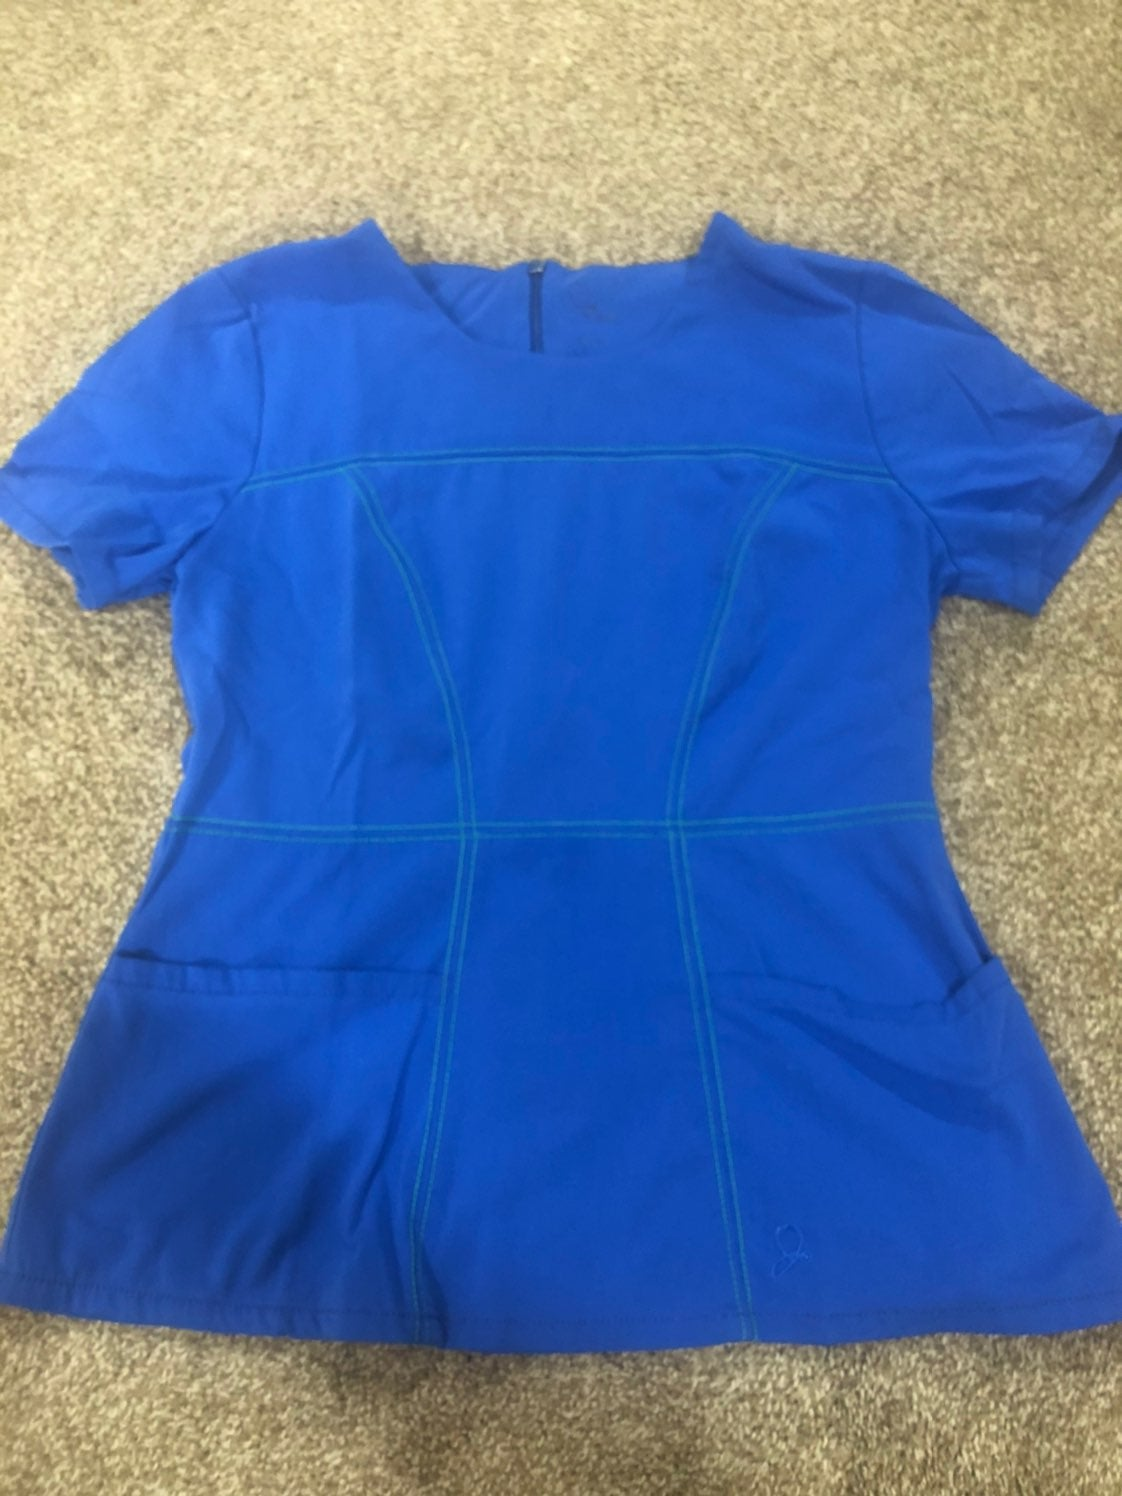 Jaanuu - Women's Royal Blue Scrub